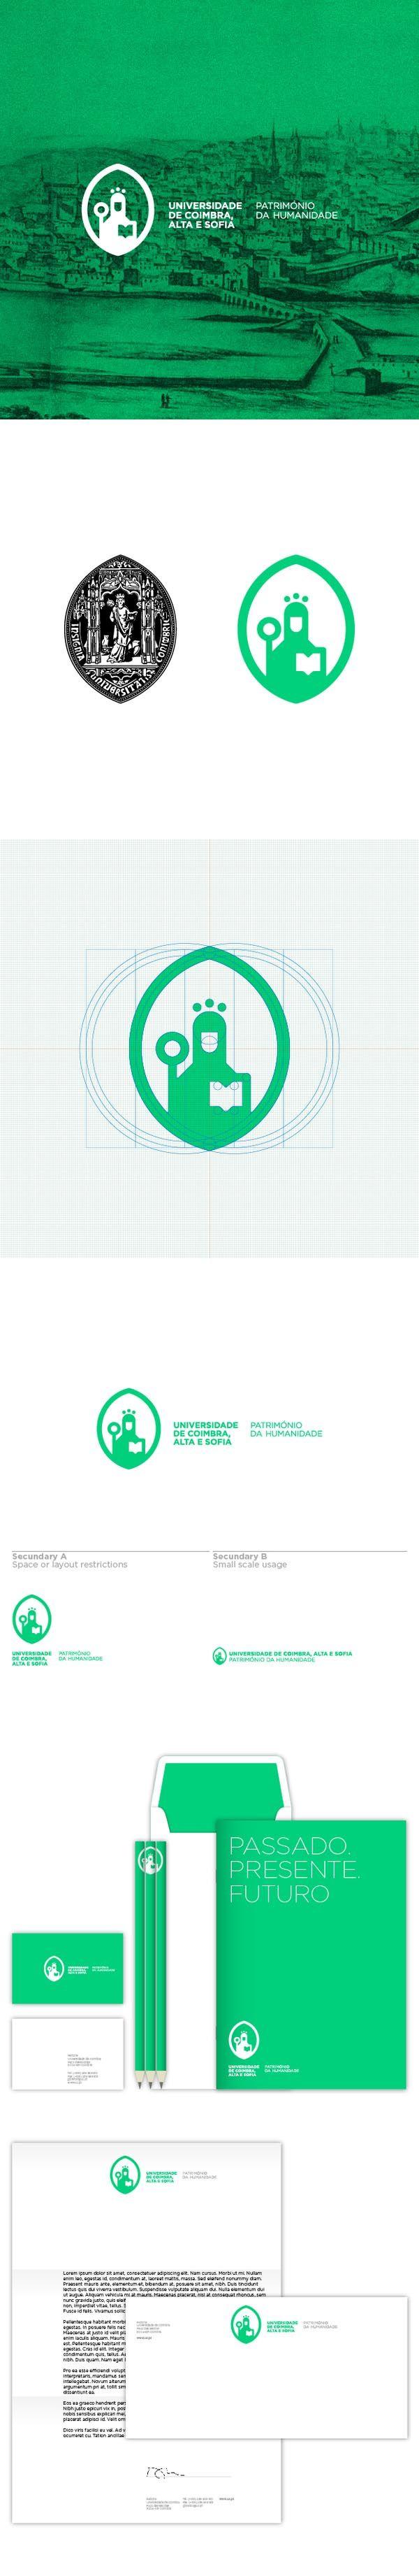 Universidade De Coimbra | #stationary #corporate #design #corporatedesign #logo #identity < < repinned by www.BlickeDeeler.de | Follow us on www.facebook.com/BlickeDeeler